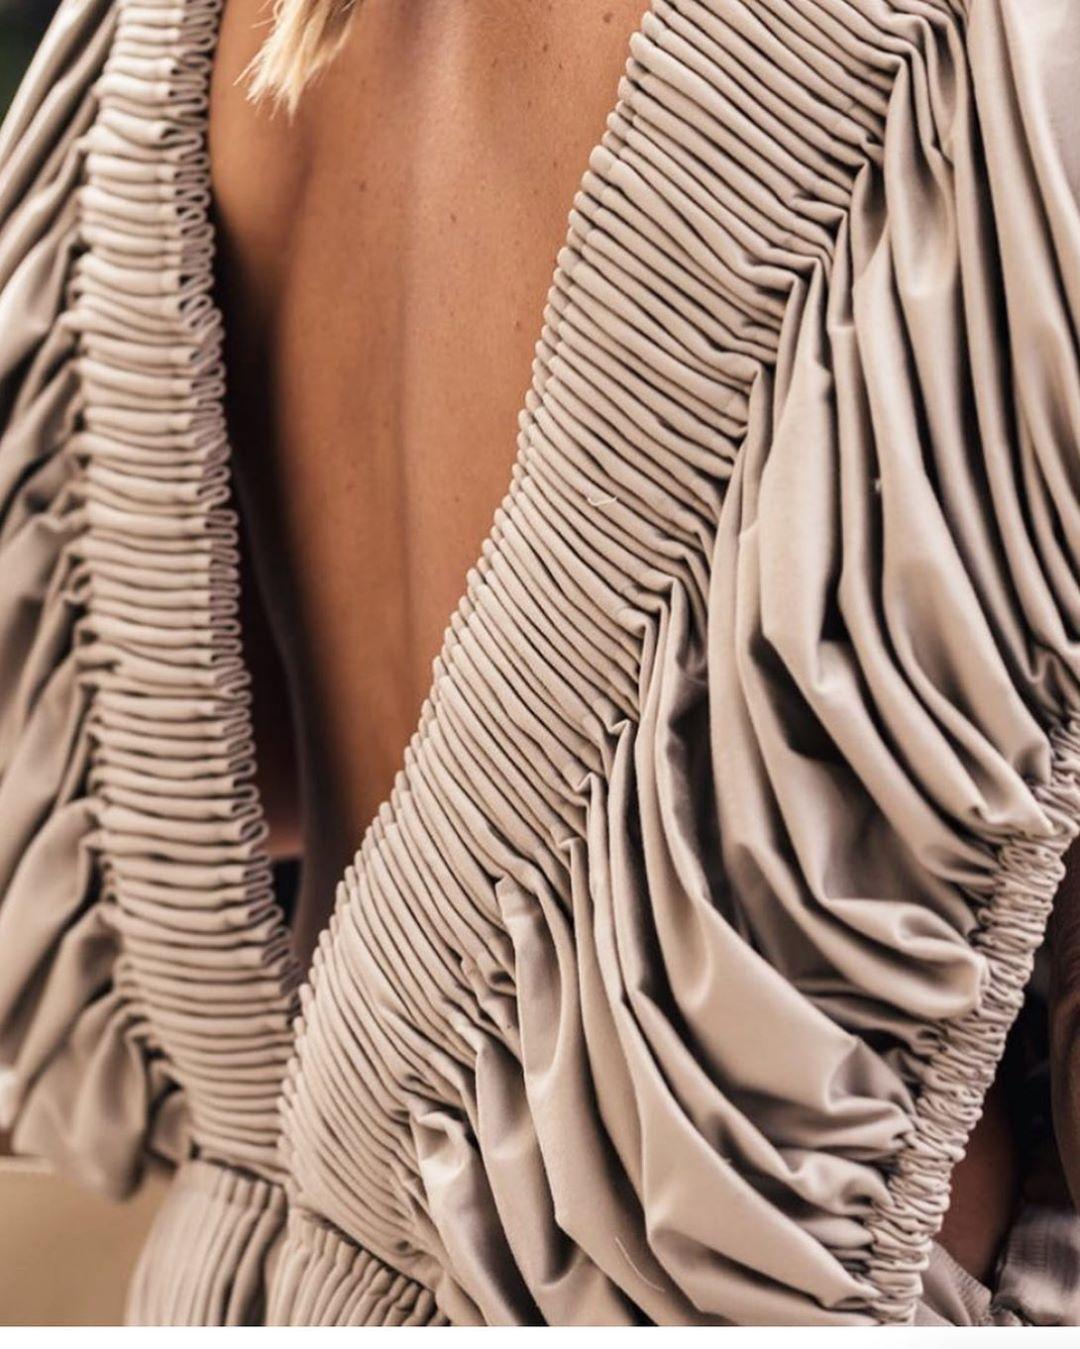 Celine Aagaard On Instagram Open Back In Paris At Issey Miyake Wearing The Desert Dress Litalweizman Angelineilmast Fashion How To Wear Fitness Fashion